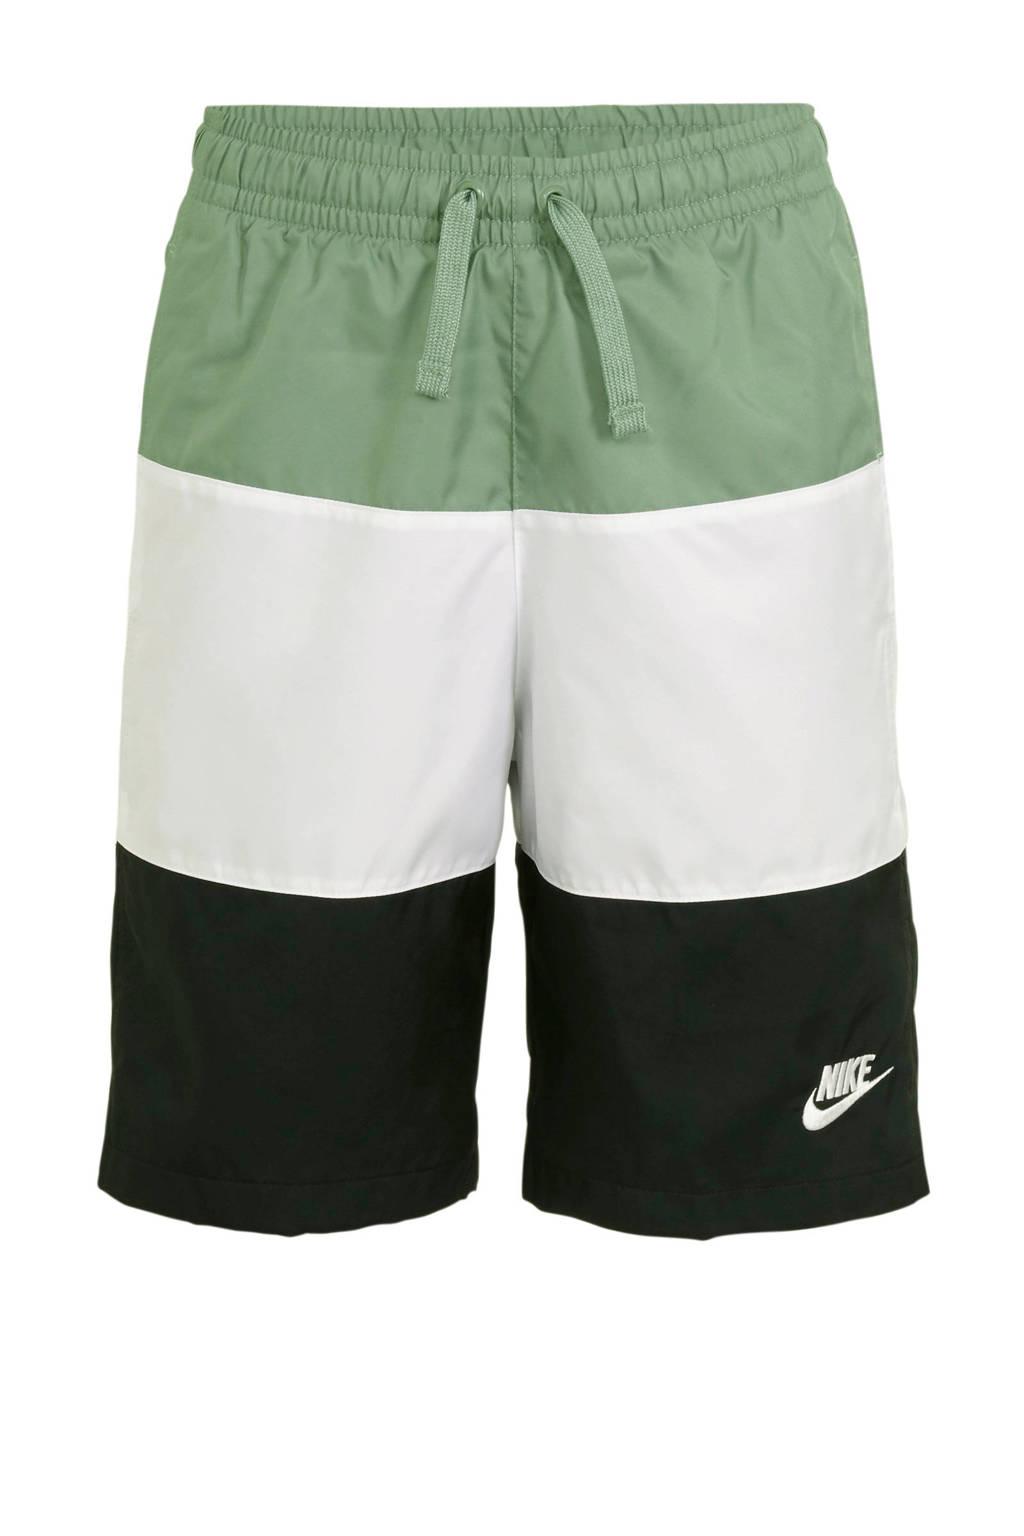 Nike short groen/wit/zwart, Groen/wit/zwart